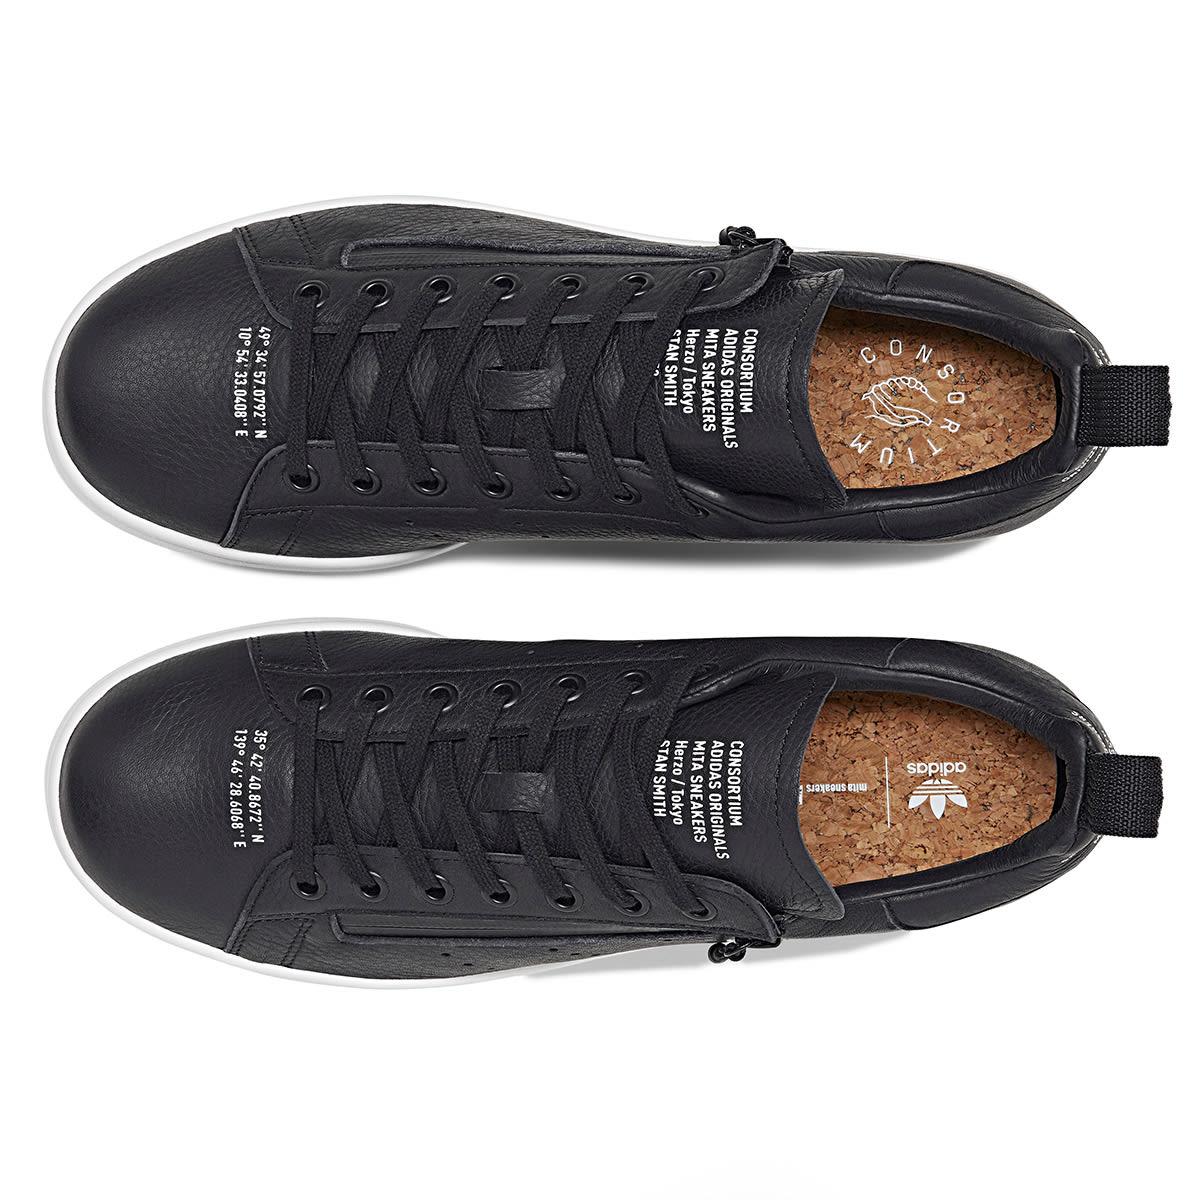 official photos 64968 bd4ec Adidas x Mita Stan Smith (Core Black & White)